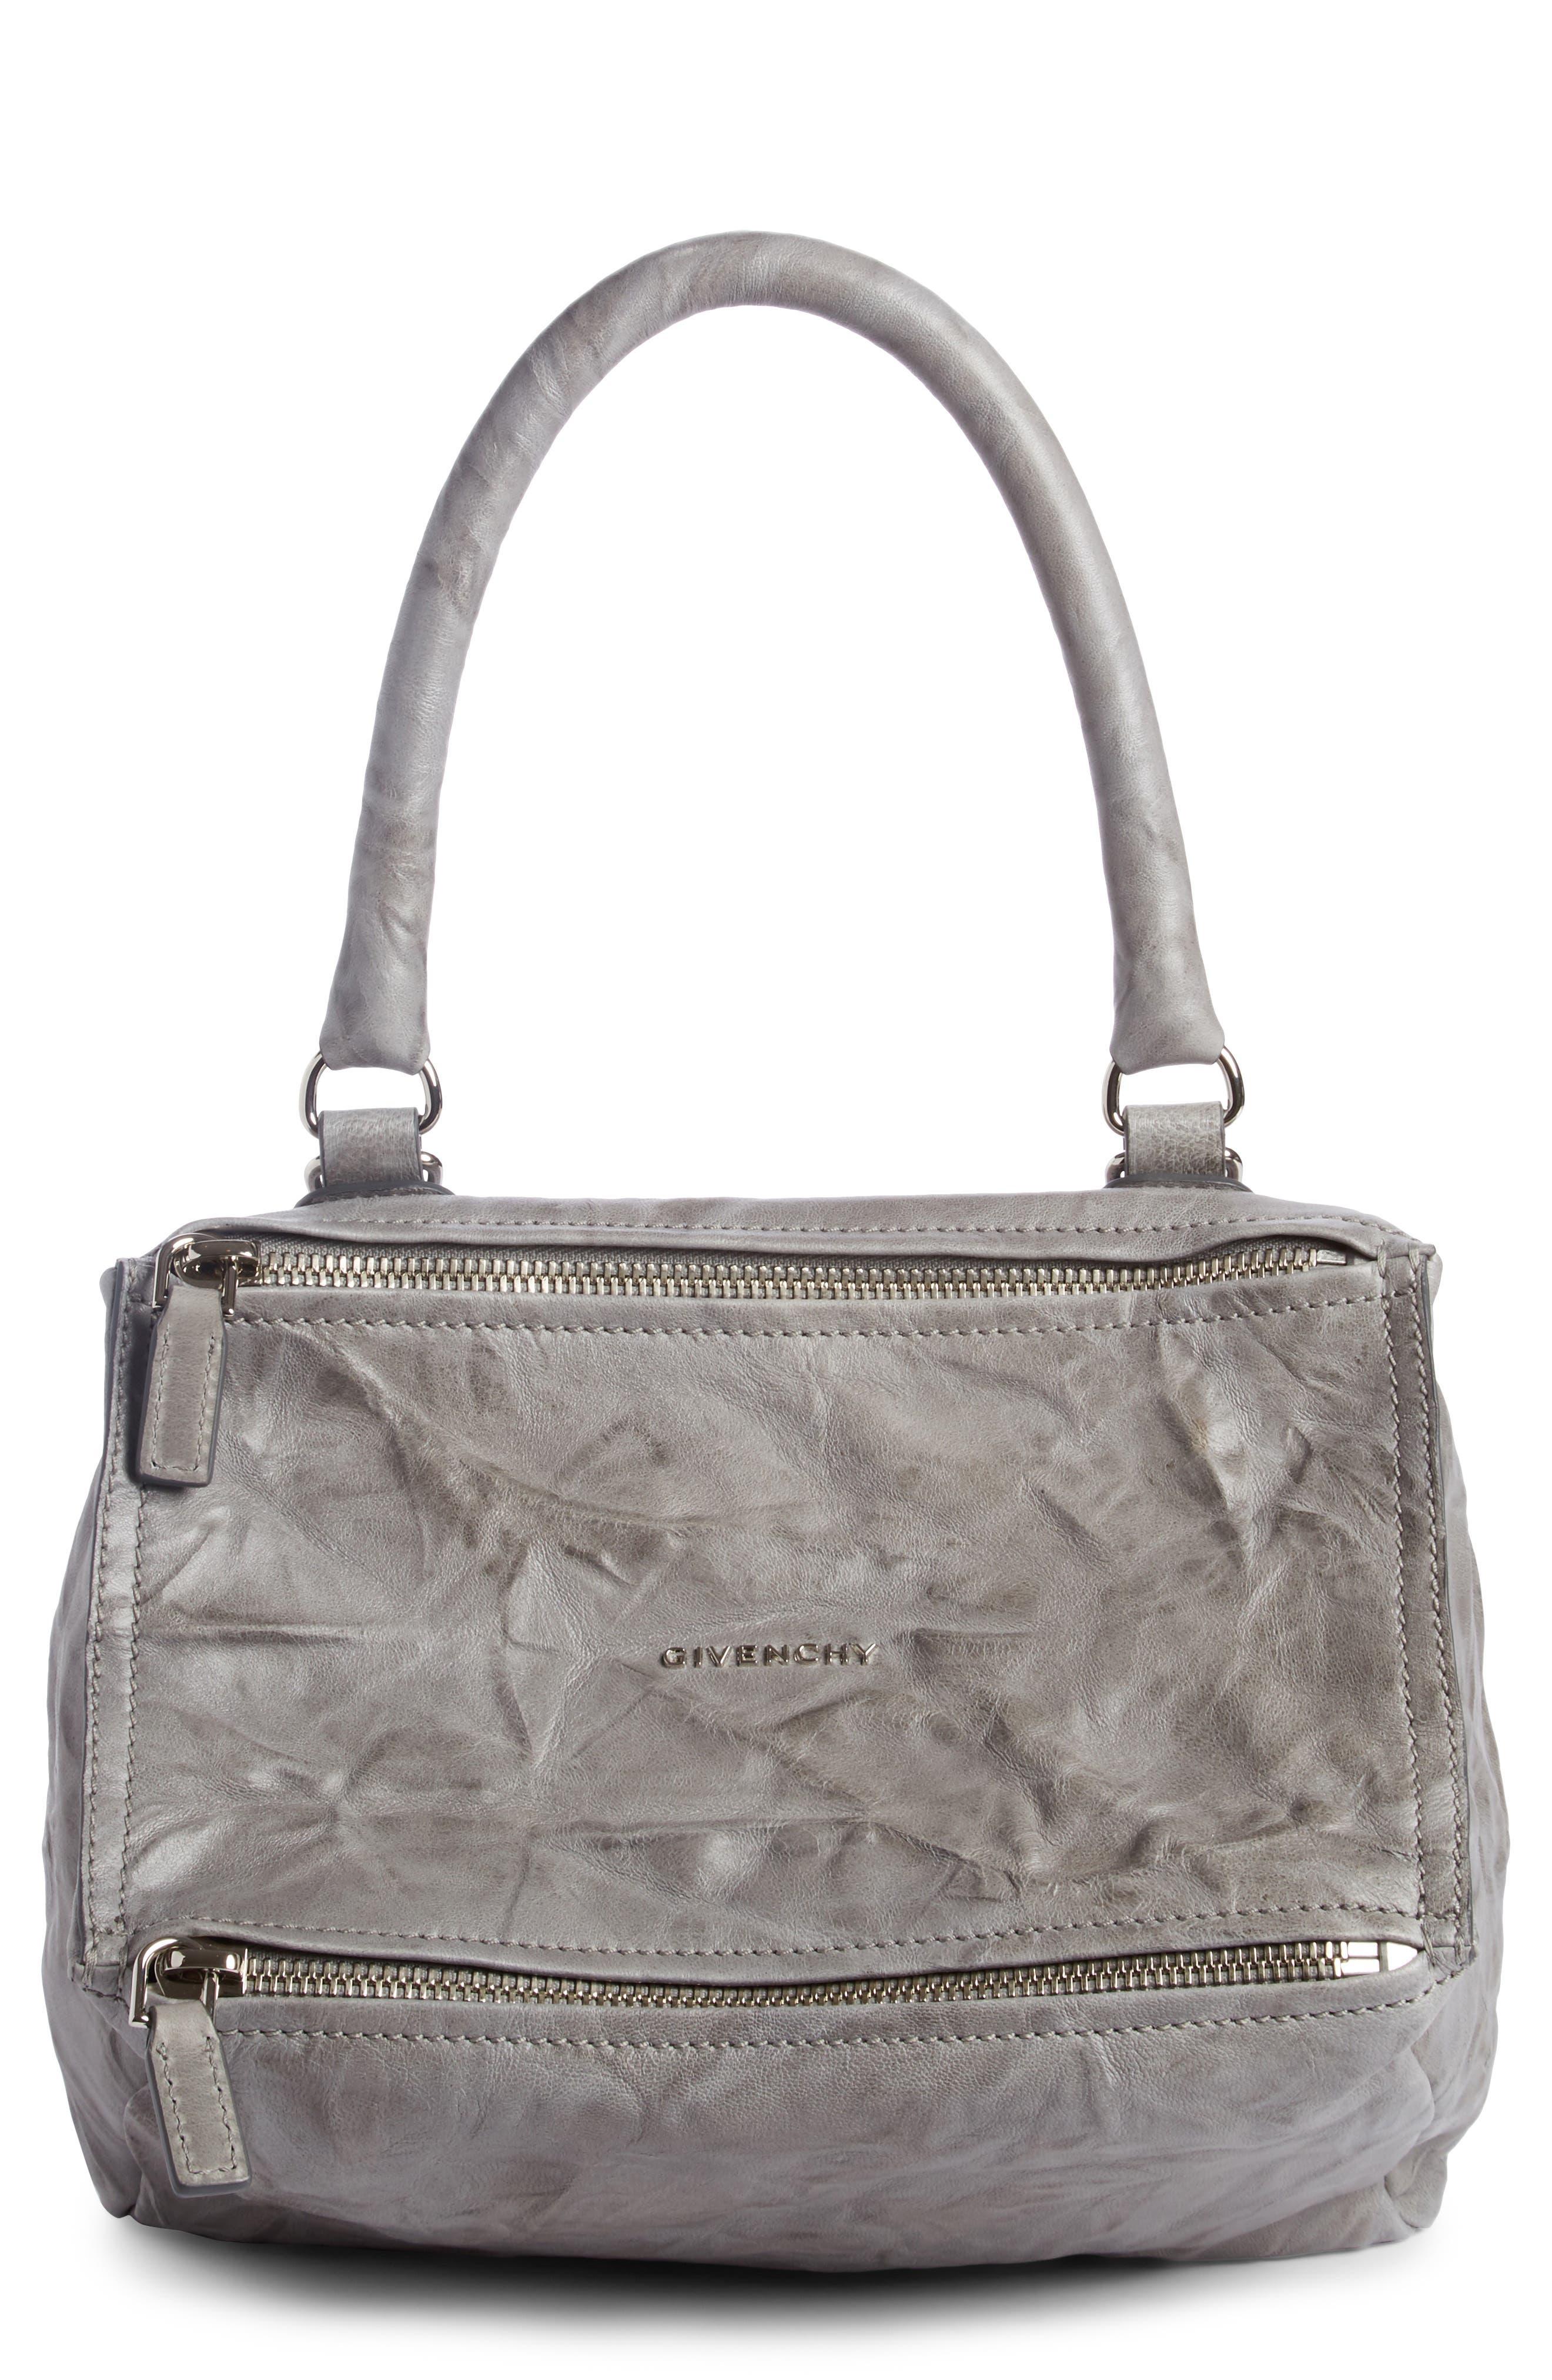 Givenchy Small Pandora Calfskin Satchel